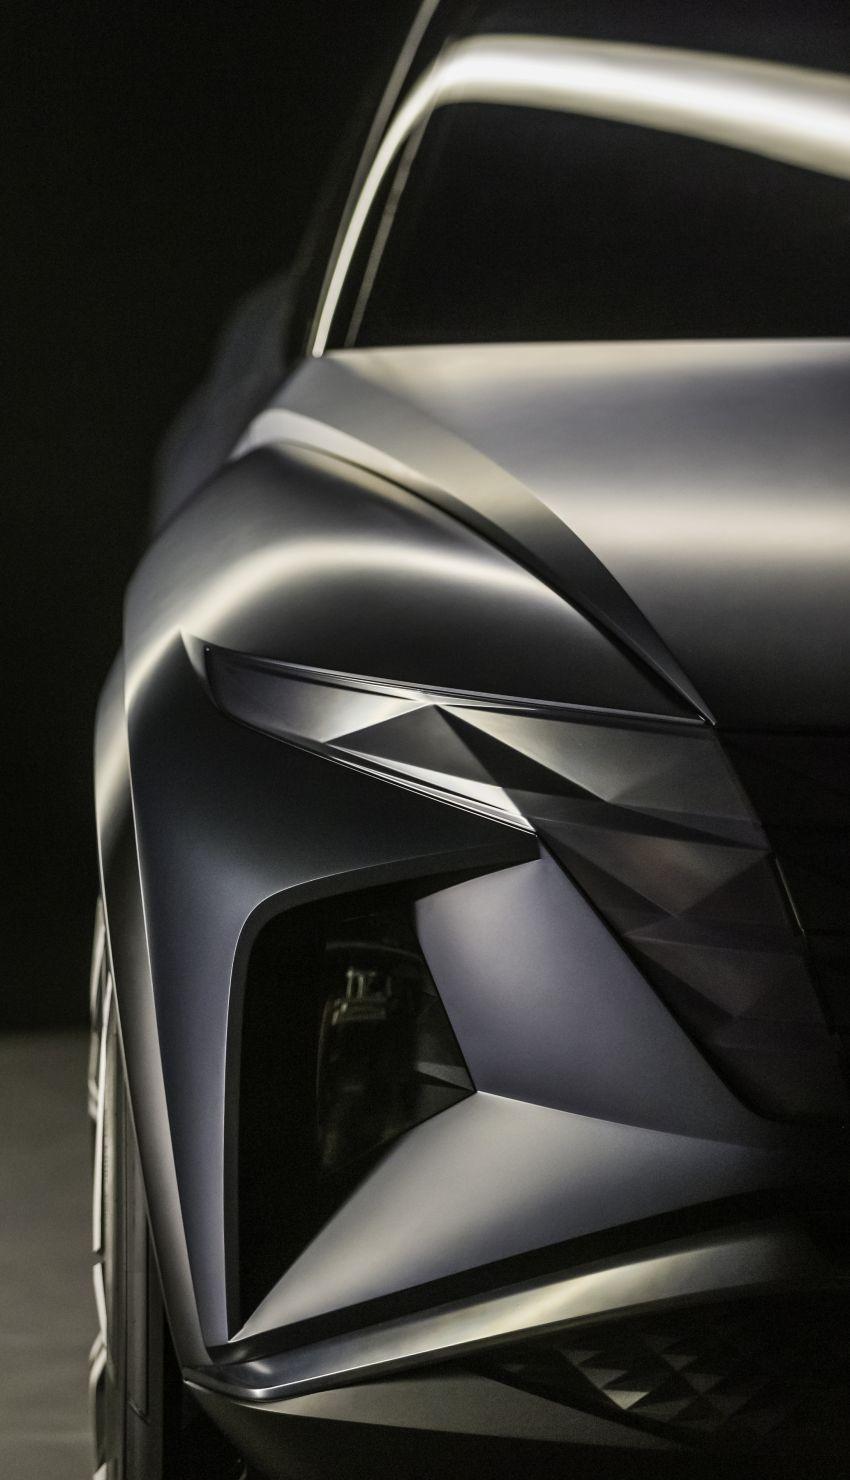 Hyundai Vision T revealed, previews next-gen Tucson Image #1049099